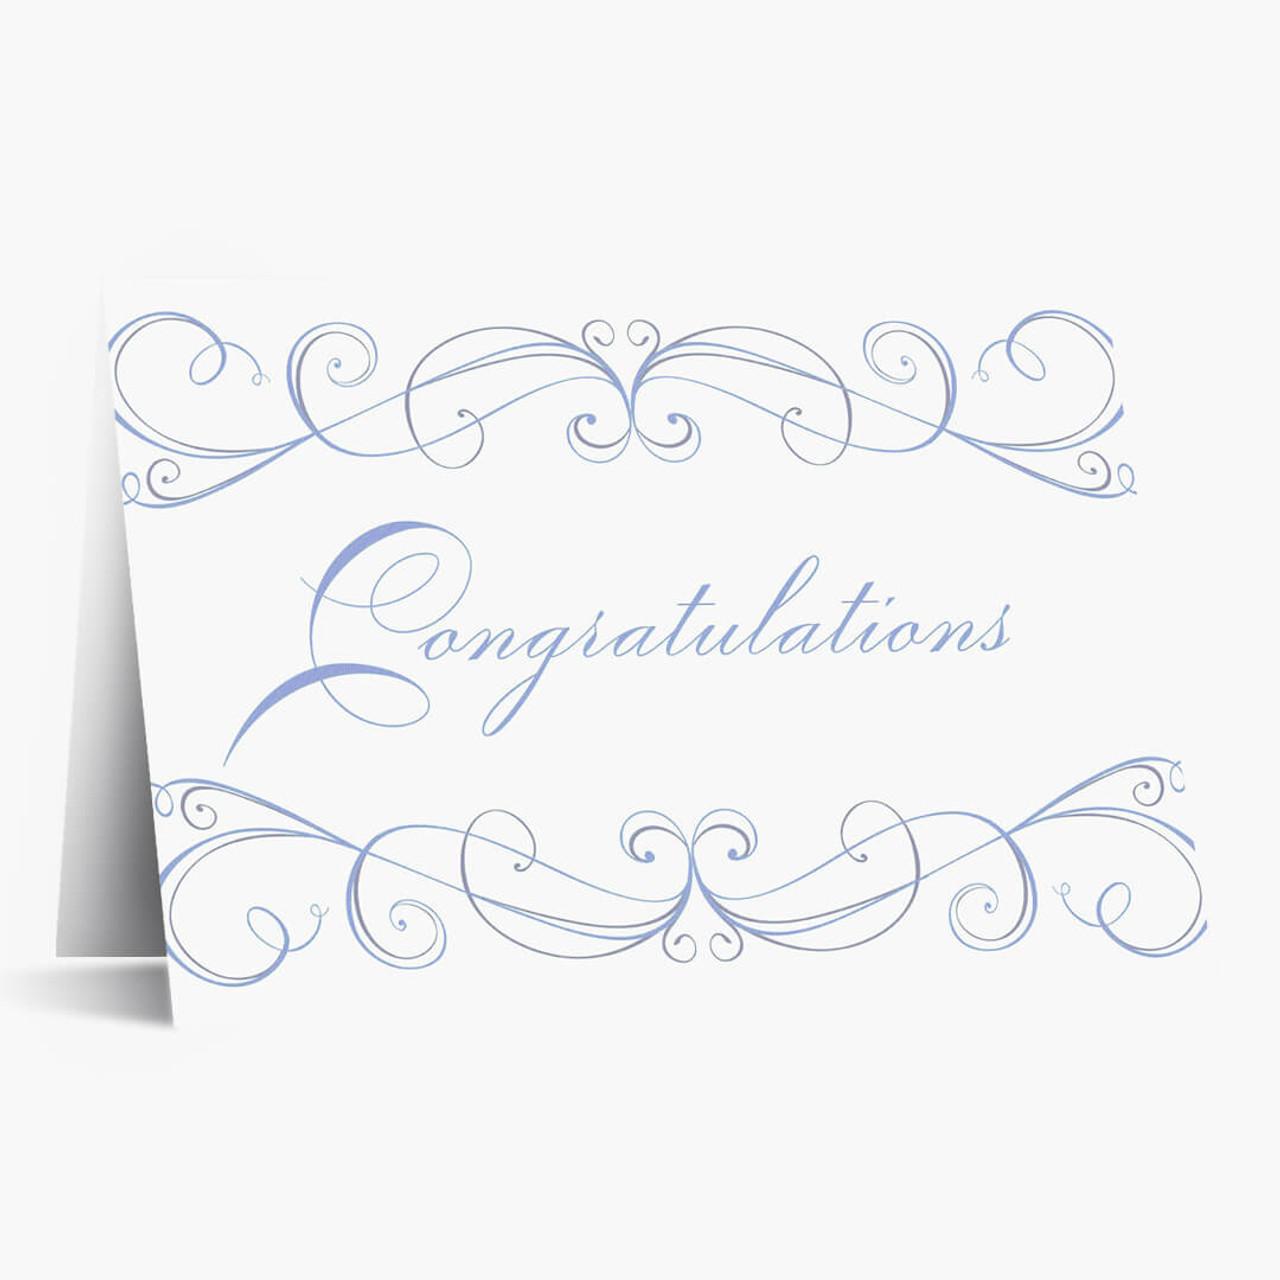 Congratultions Flourish